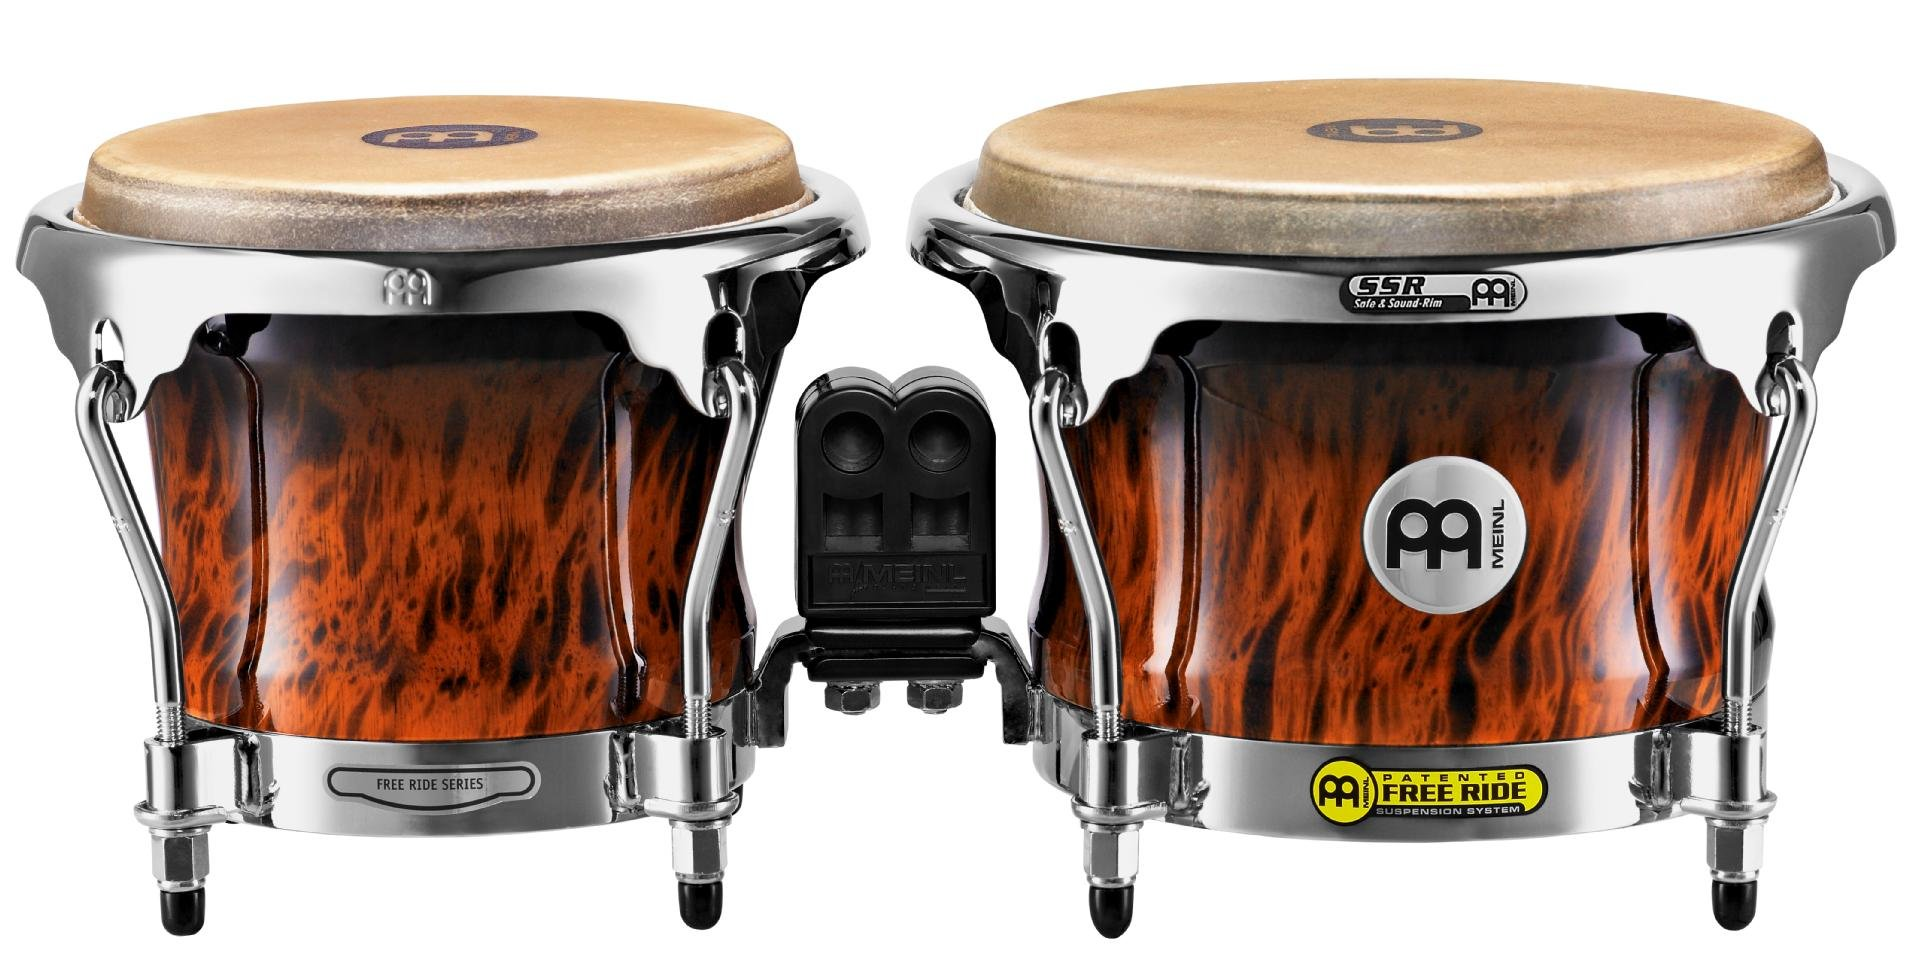 Meinl Percussion FWB400BB Free Ride Series Wood Bongos, Brown Burl Finish